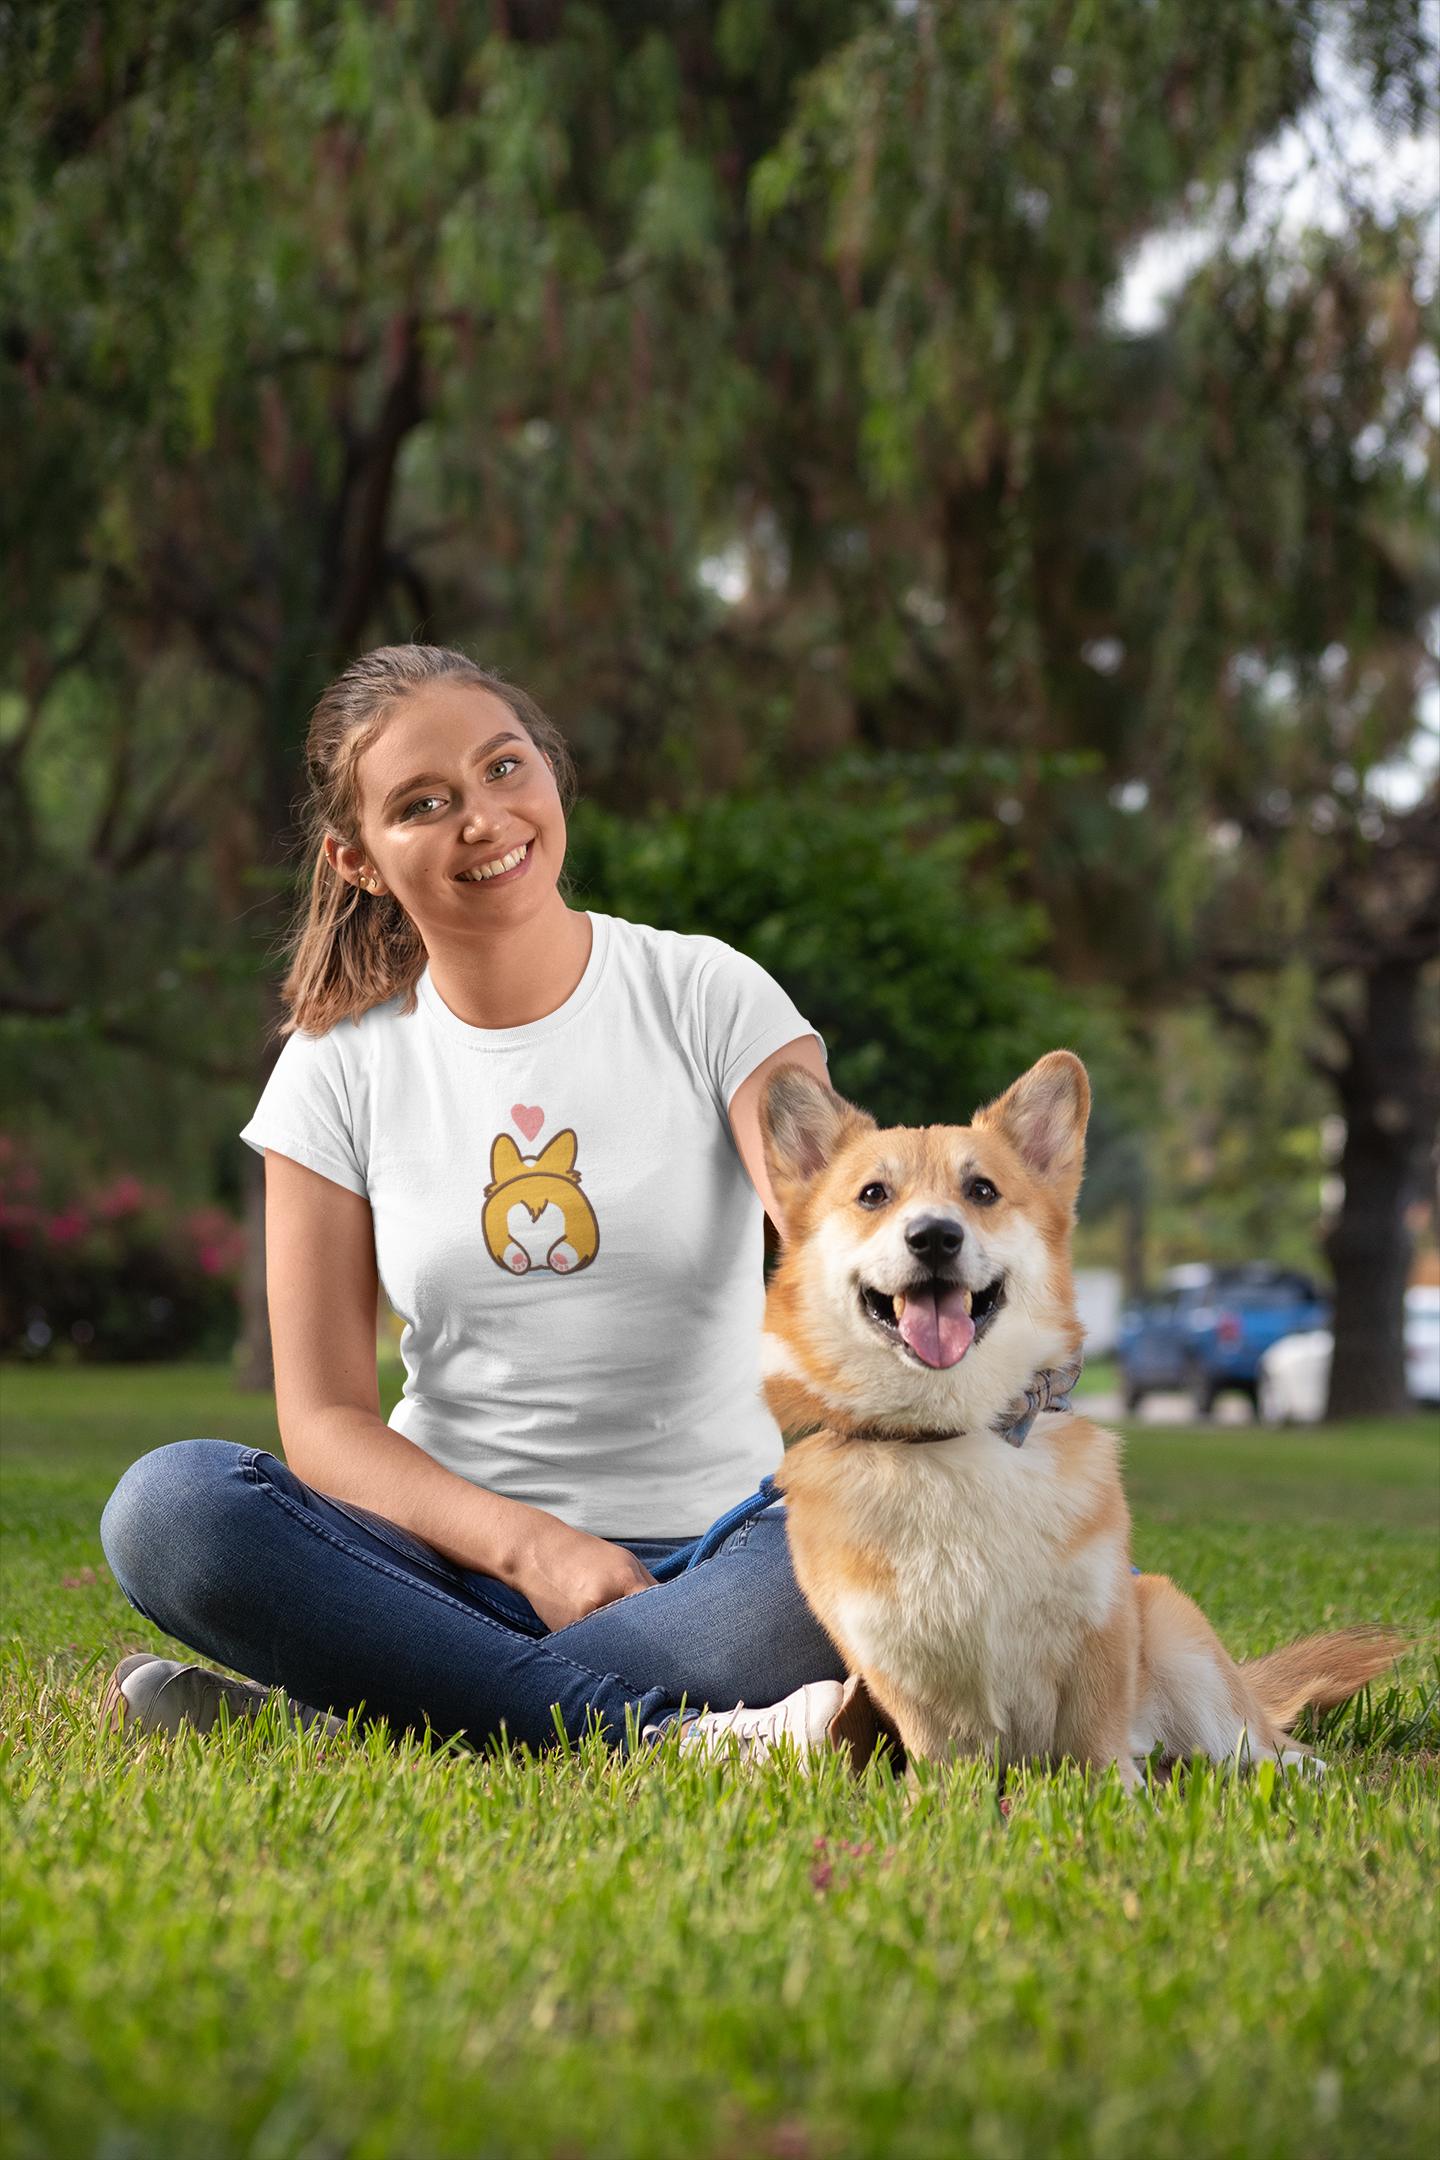 Embroidered t-shirt with Corgi design